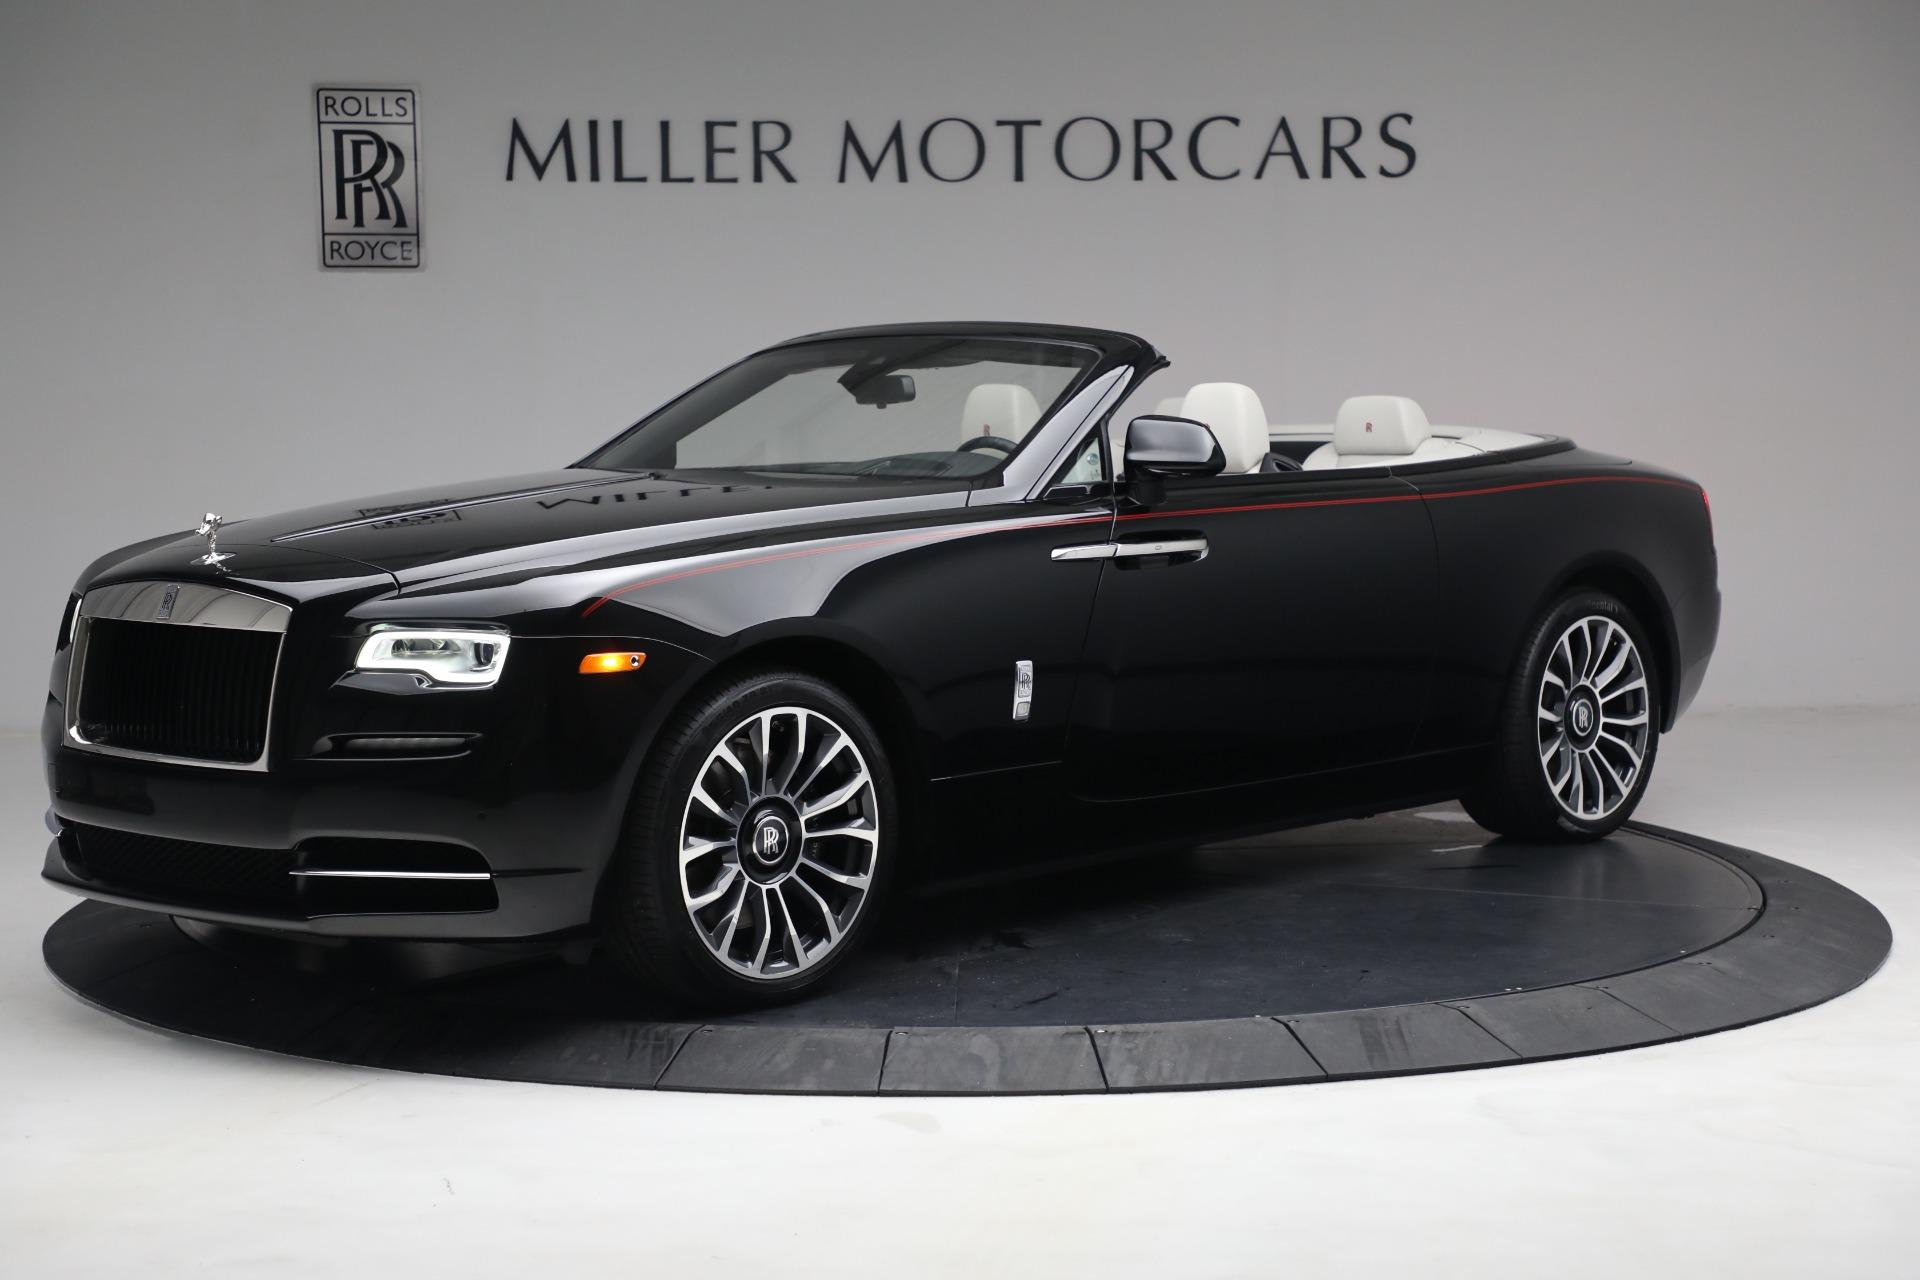 Used 2019 Rolls-Royce Dawn for sale $379,900 at Rolls-Royce Motor Cars Greenwich in Greenwich CT 06830 1